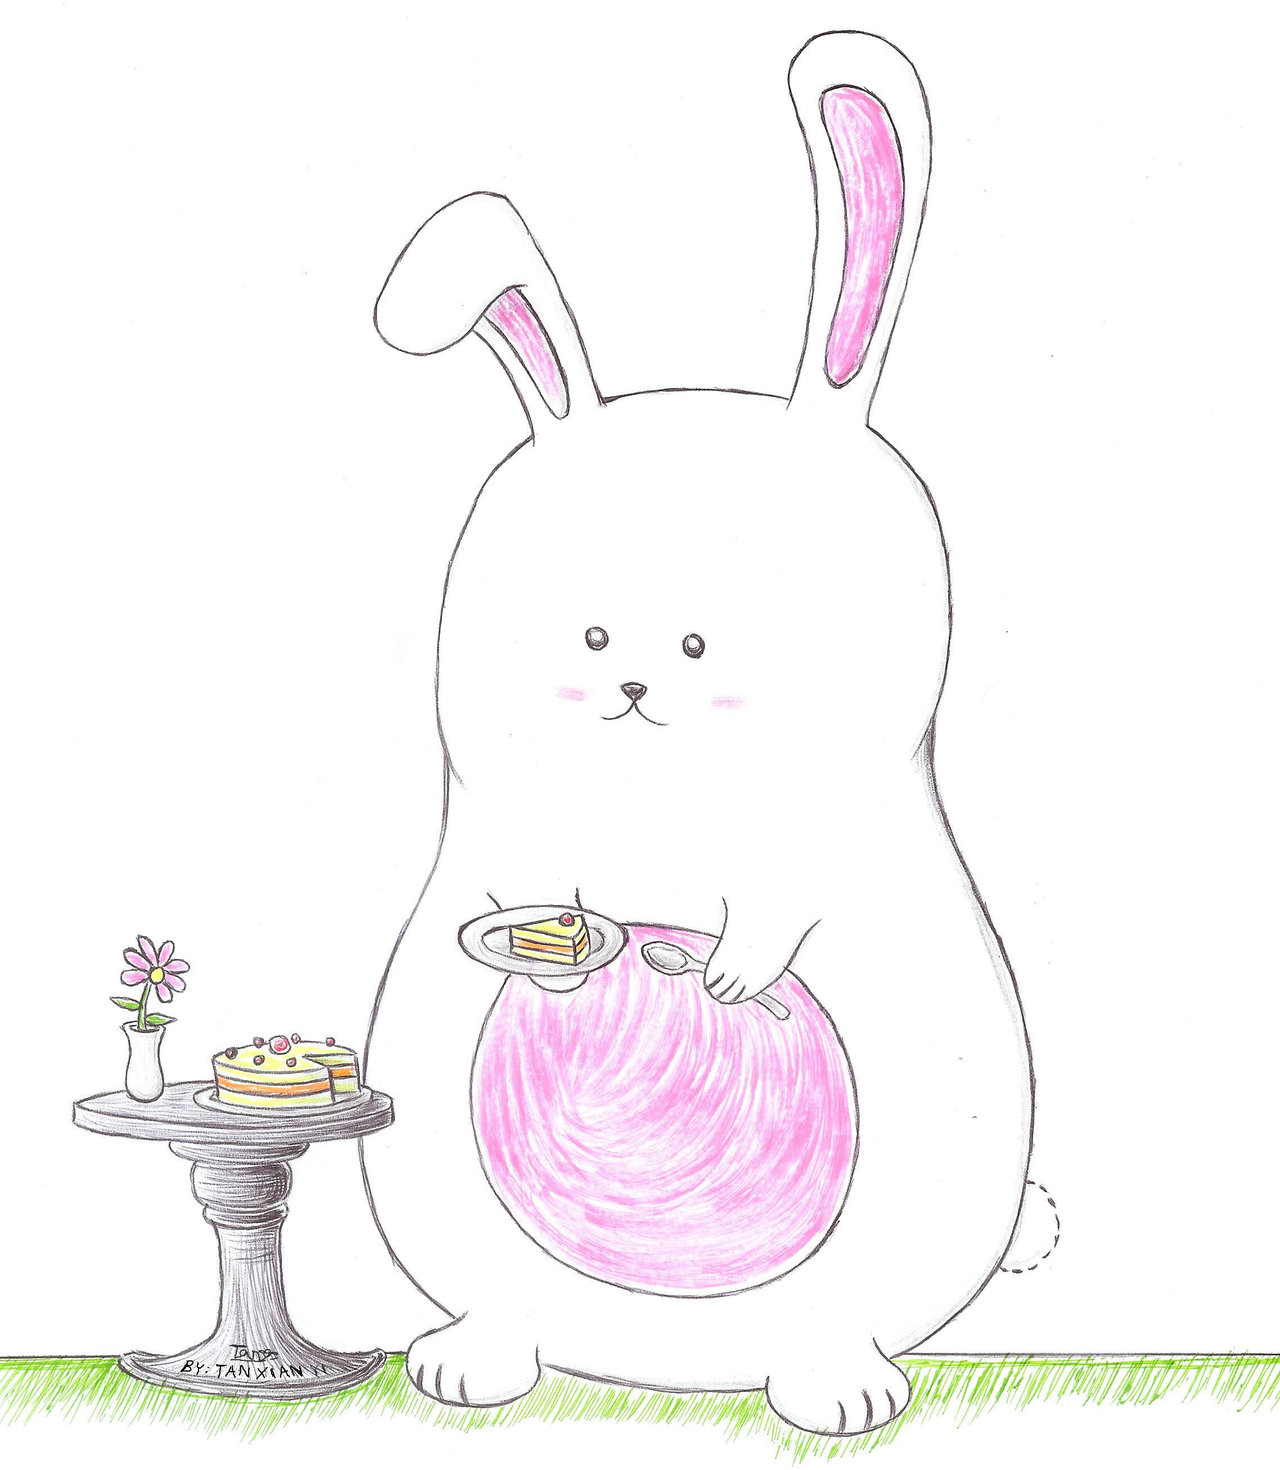 Drawn bunny chubby bunny On txy45 by bunny Chubby